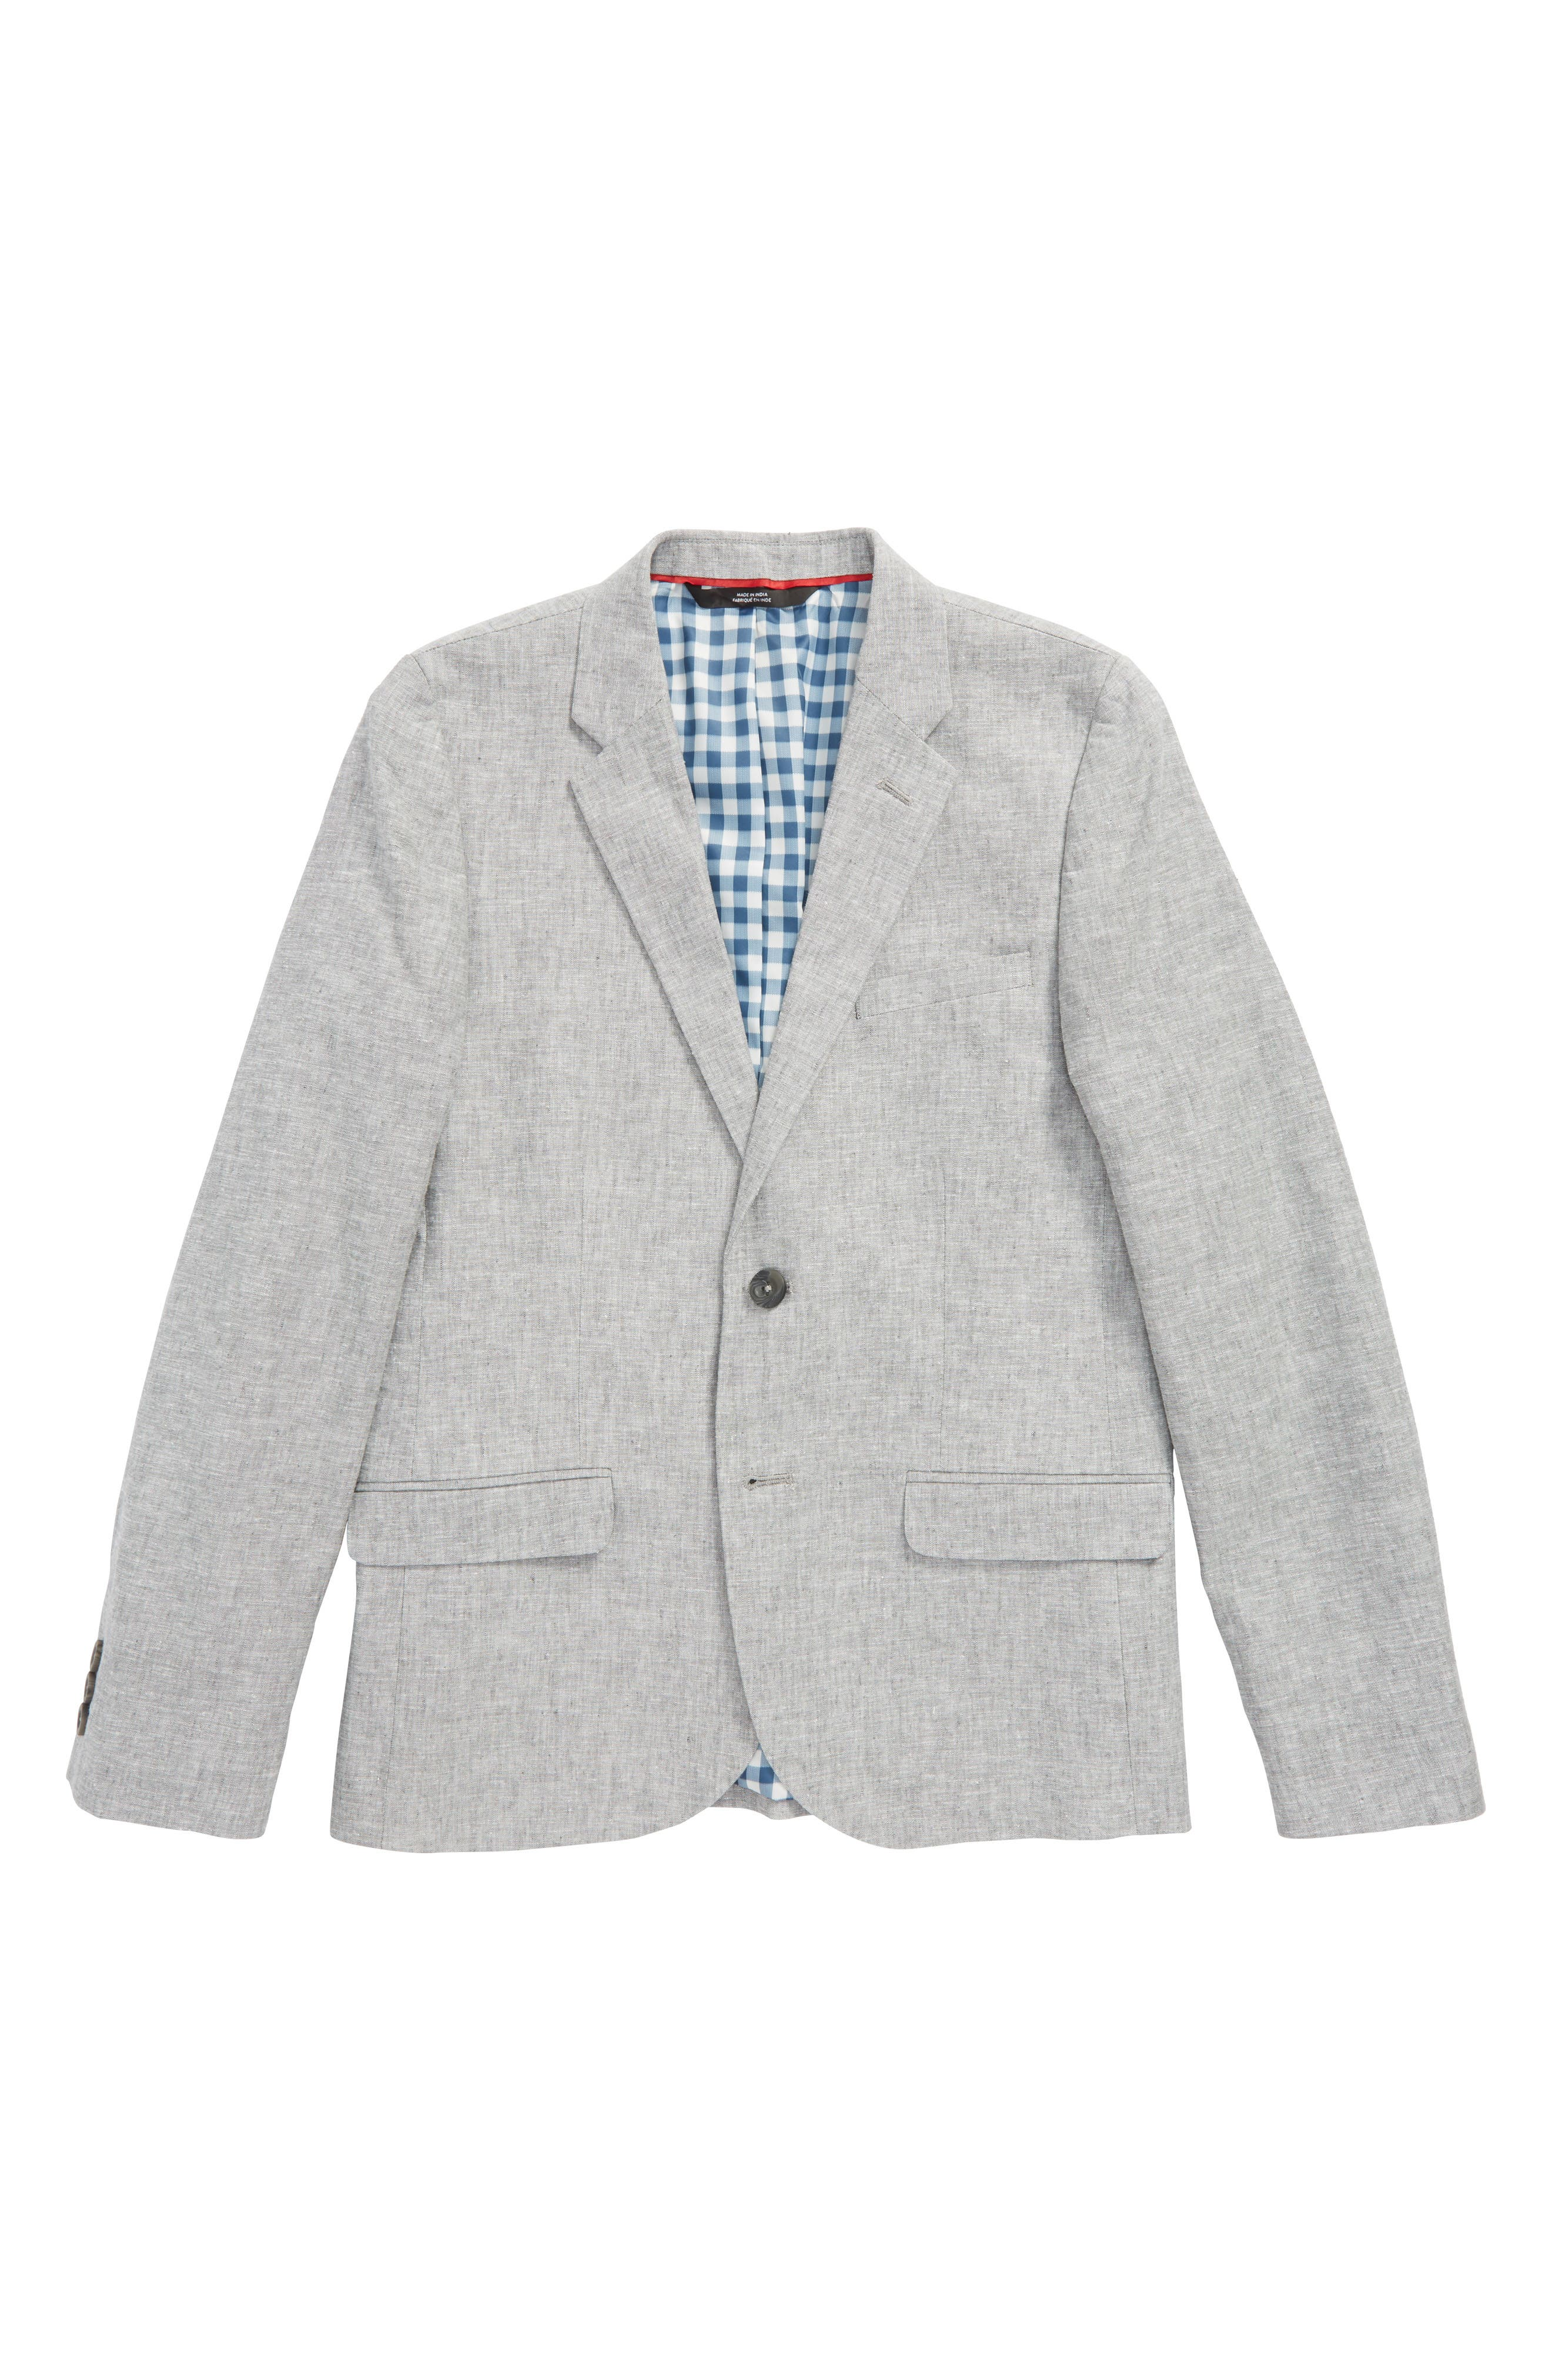 NORDSTROM Elliott Linen & Cotton Blazer, Main, color, 030